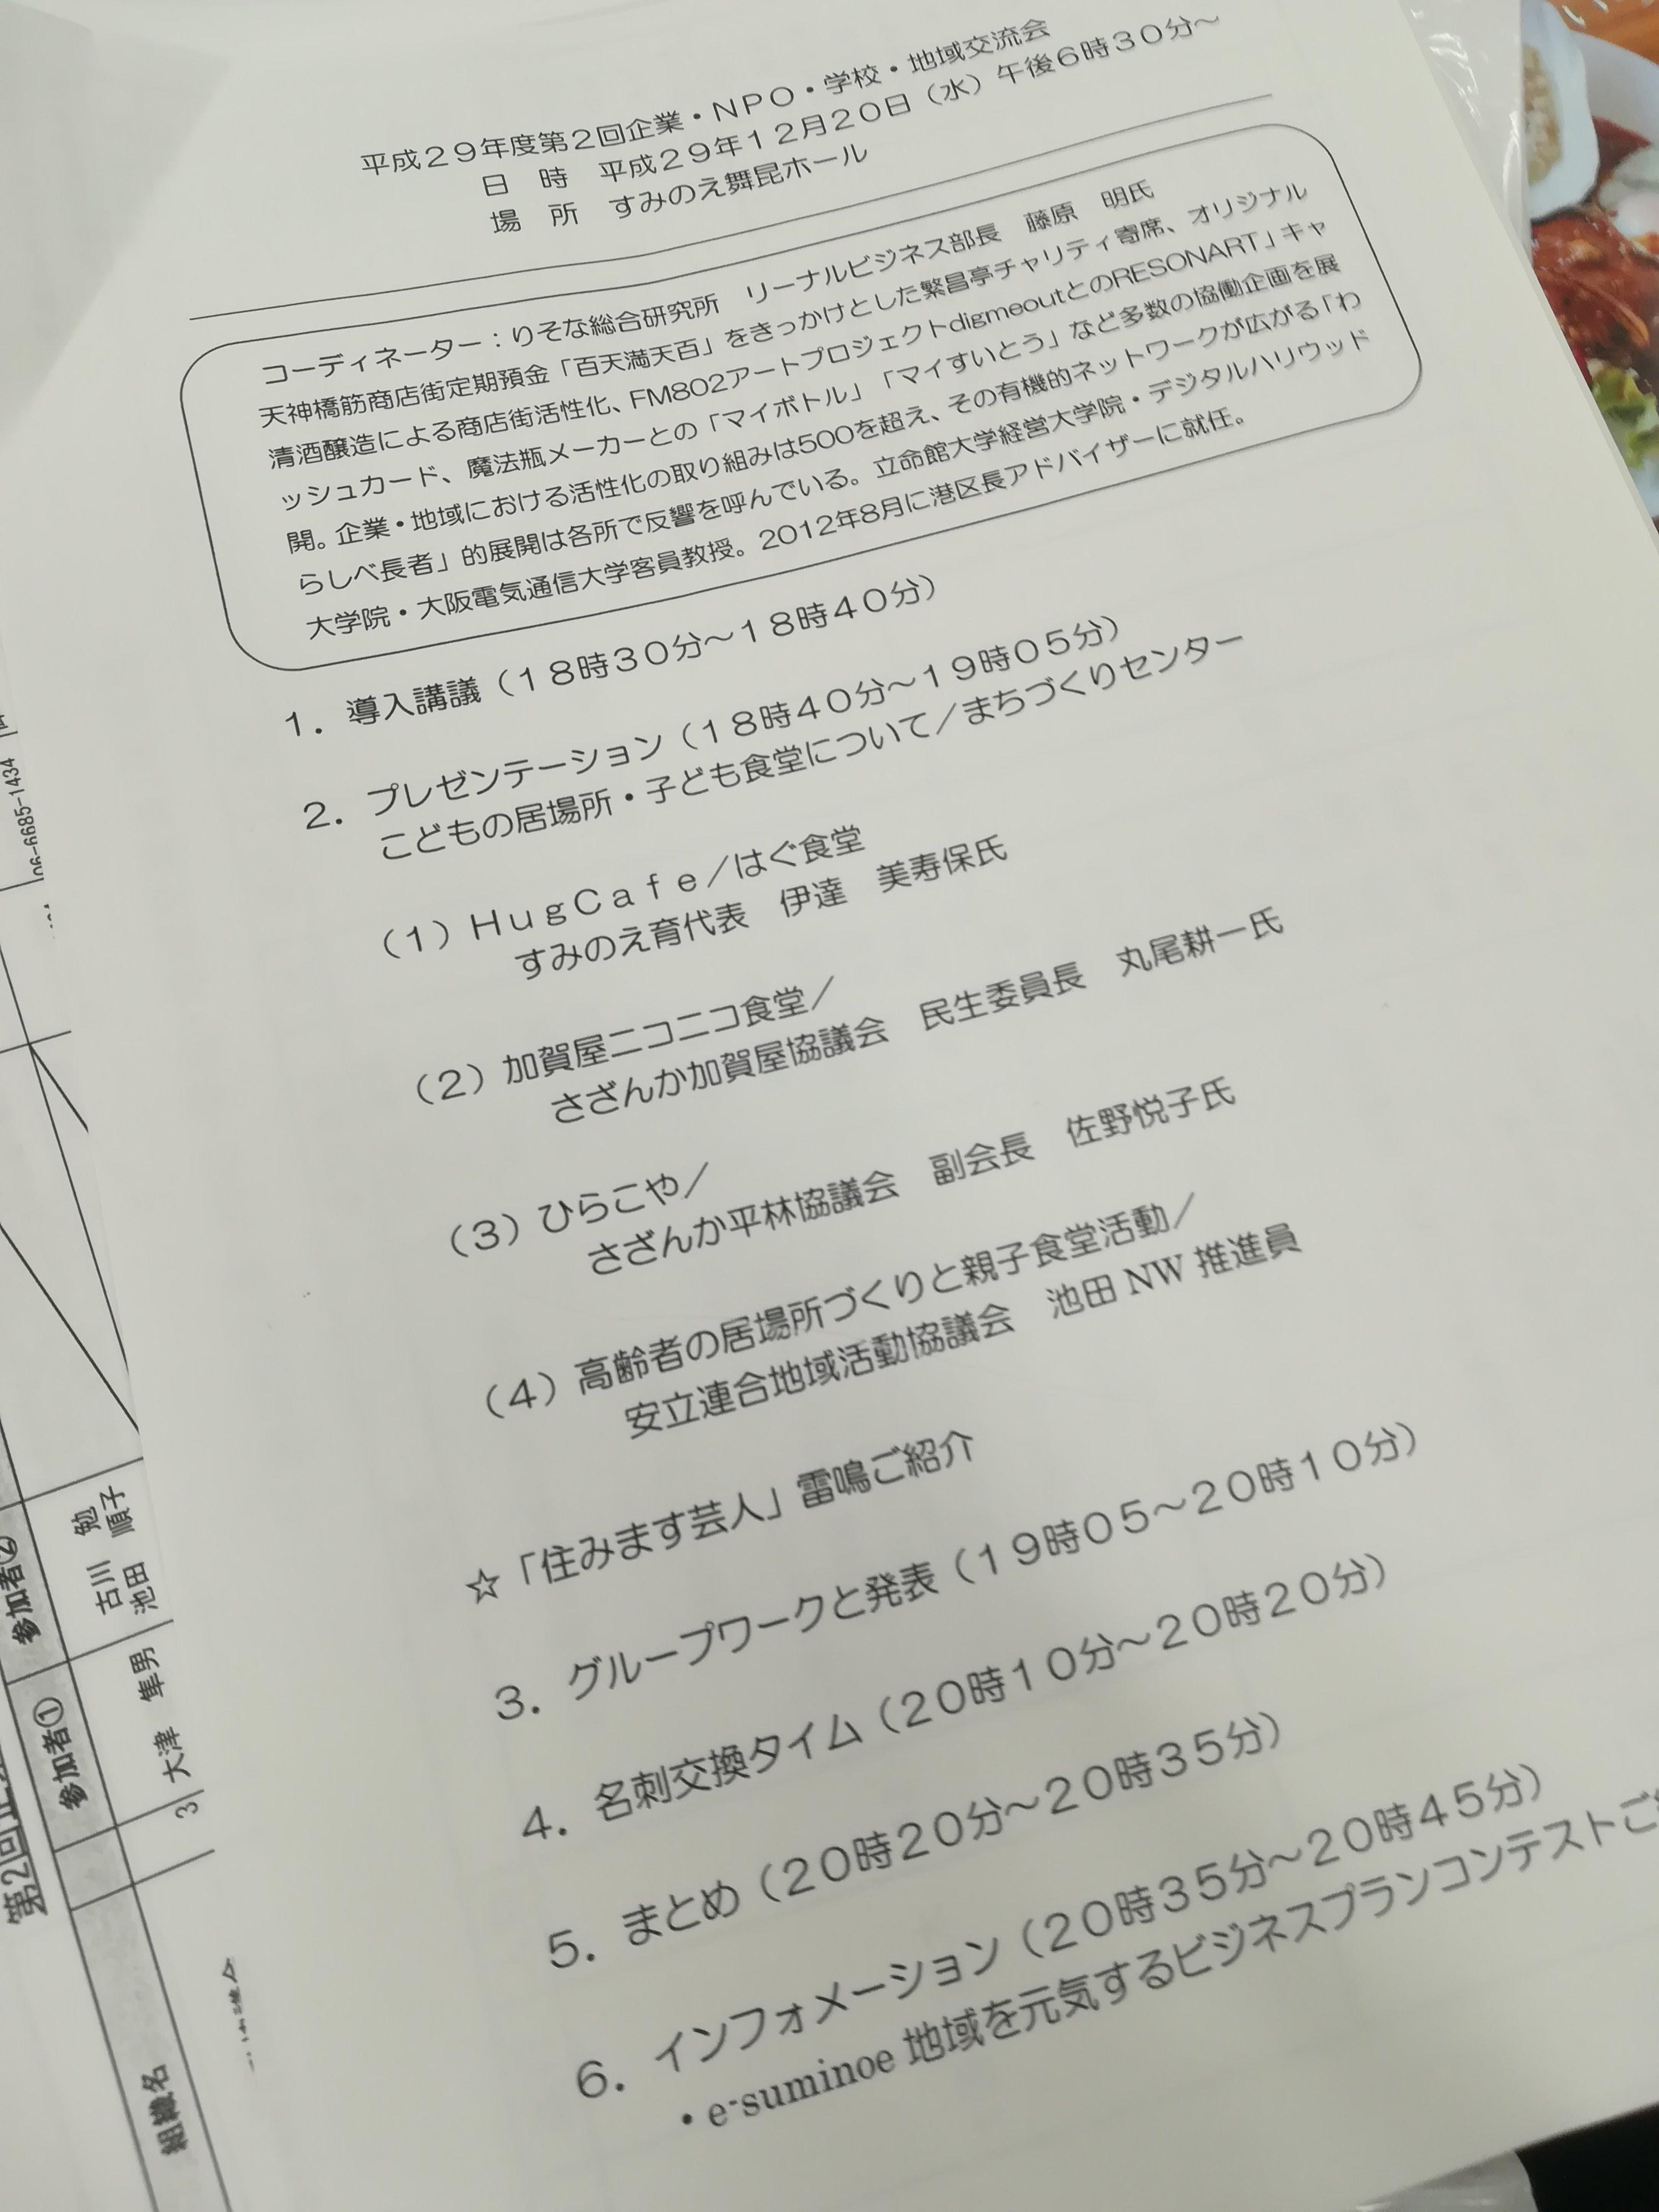 HUG Cafe/はぐ食堂の活動を住之江区交流会で発表した様子が住之江区ホームページに掲載されています